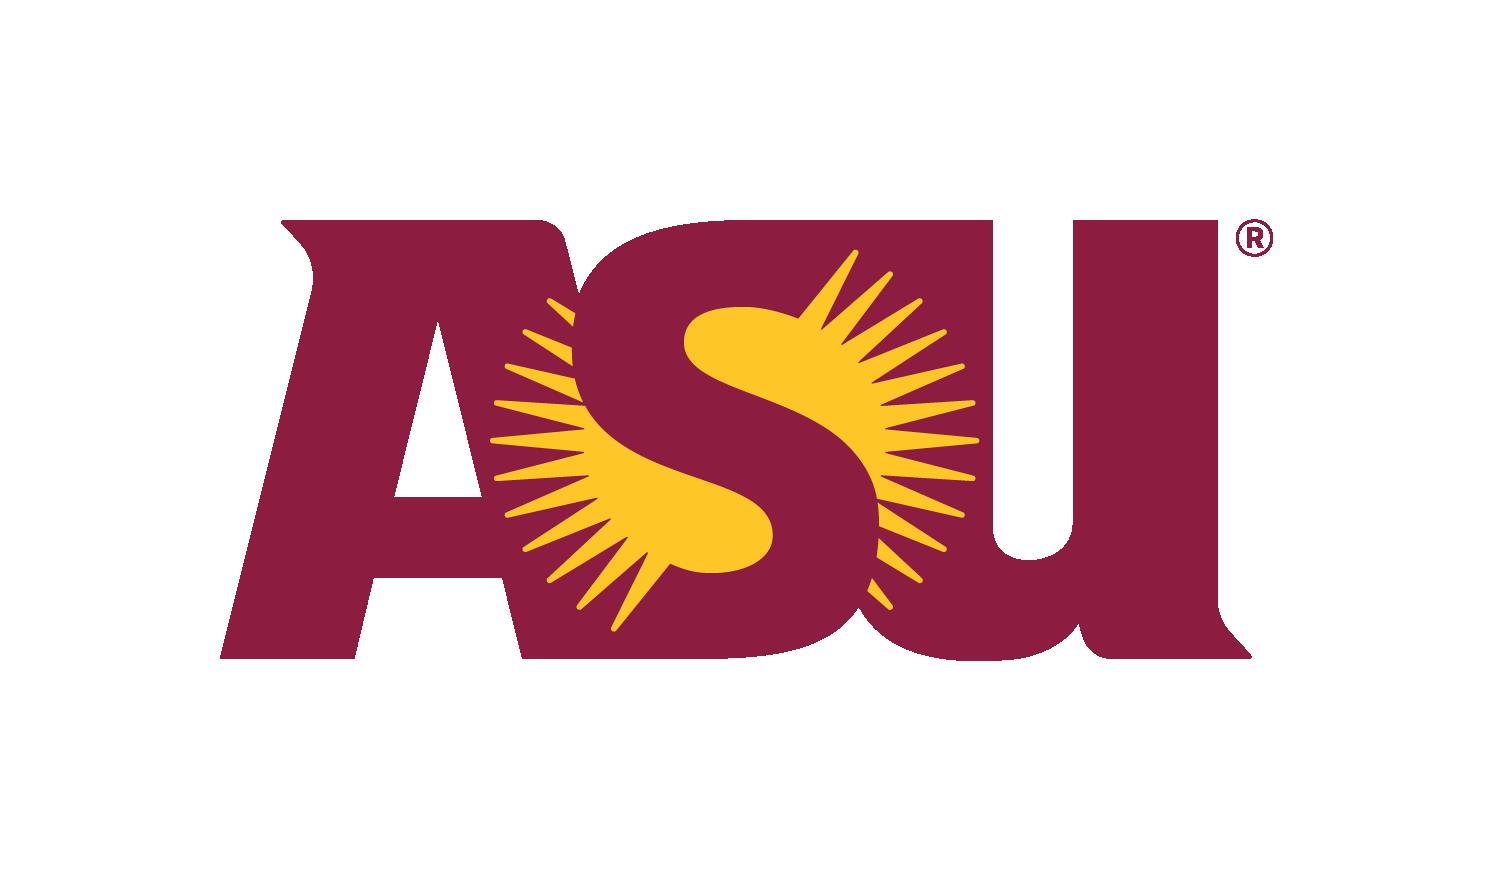 Maroon and gold ASU sunburst logo on a white background